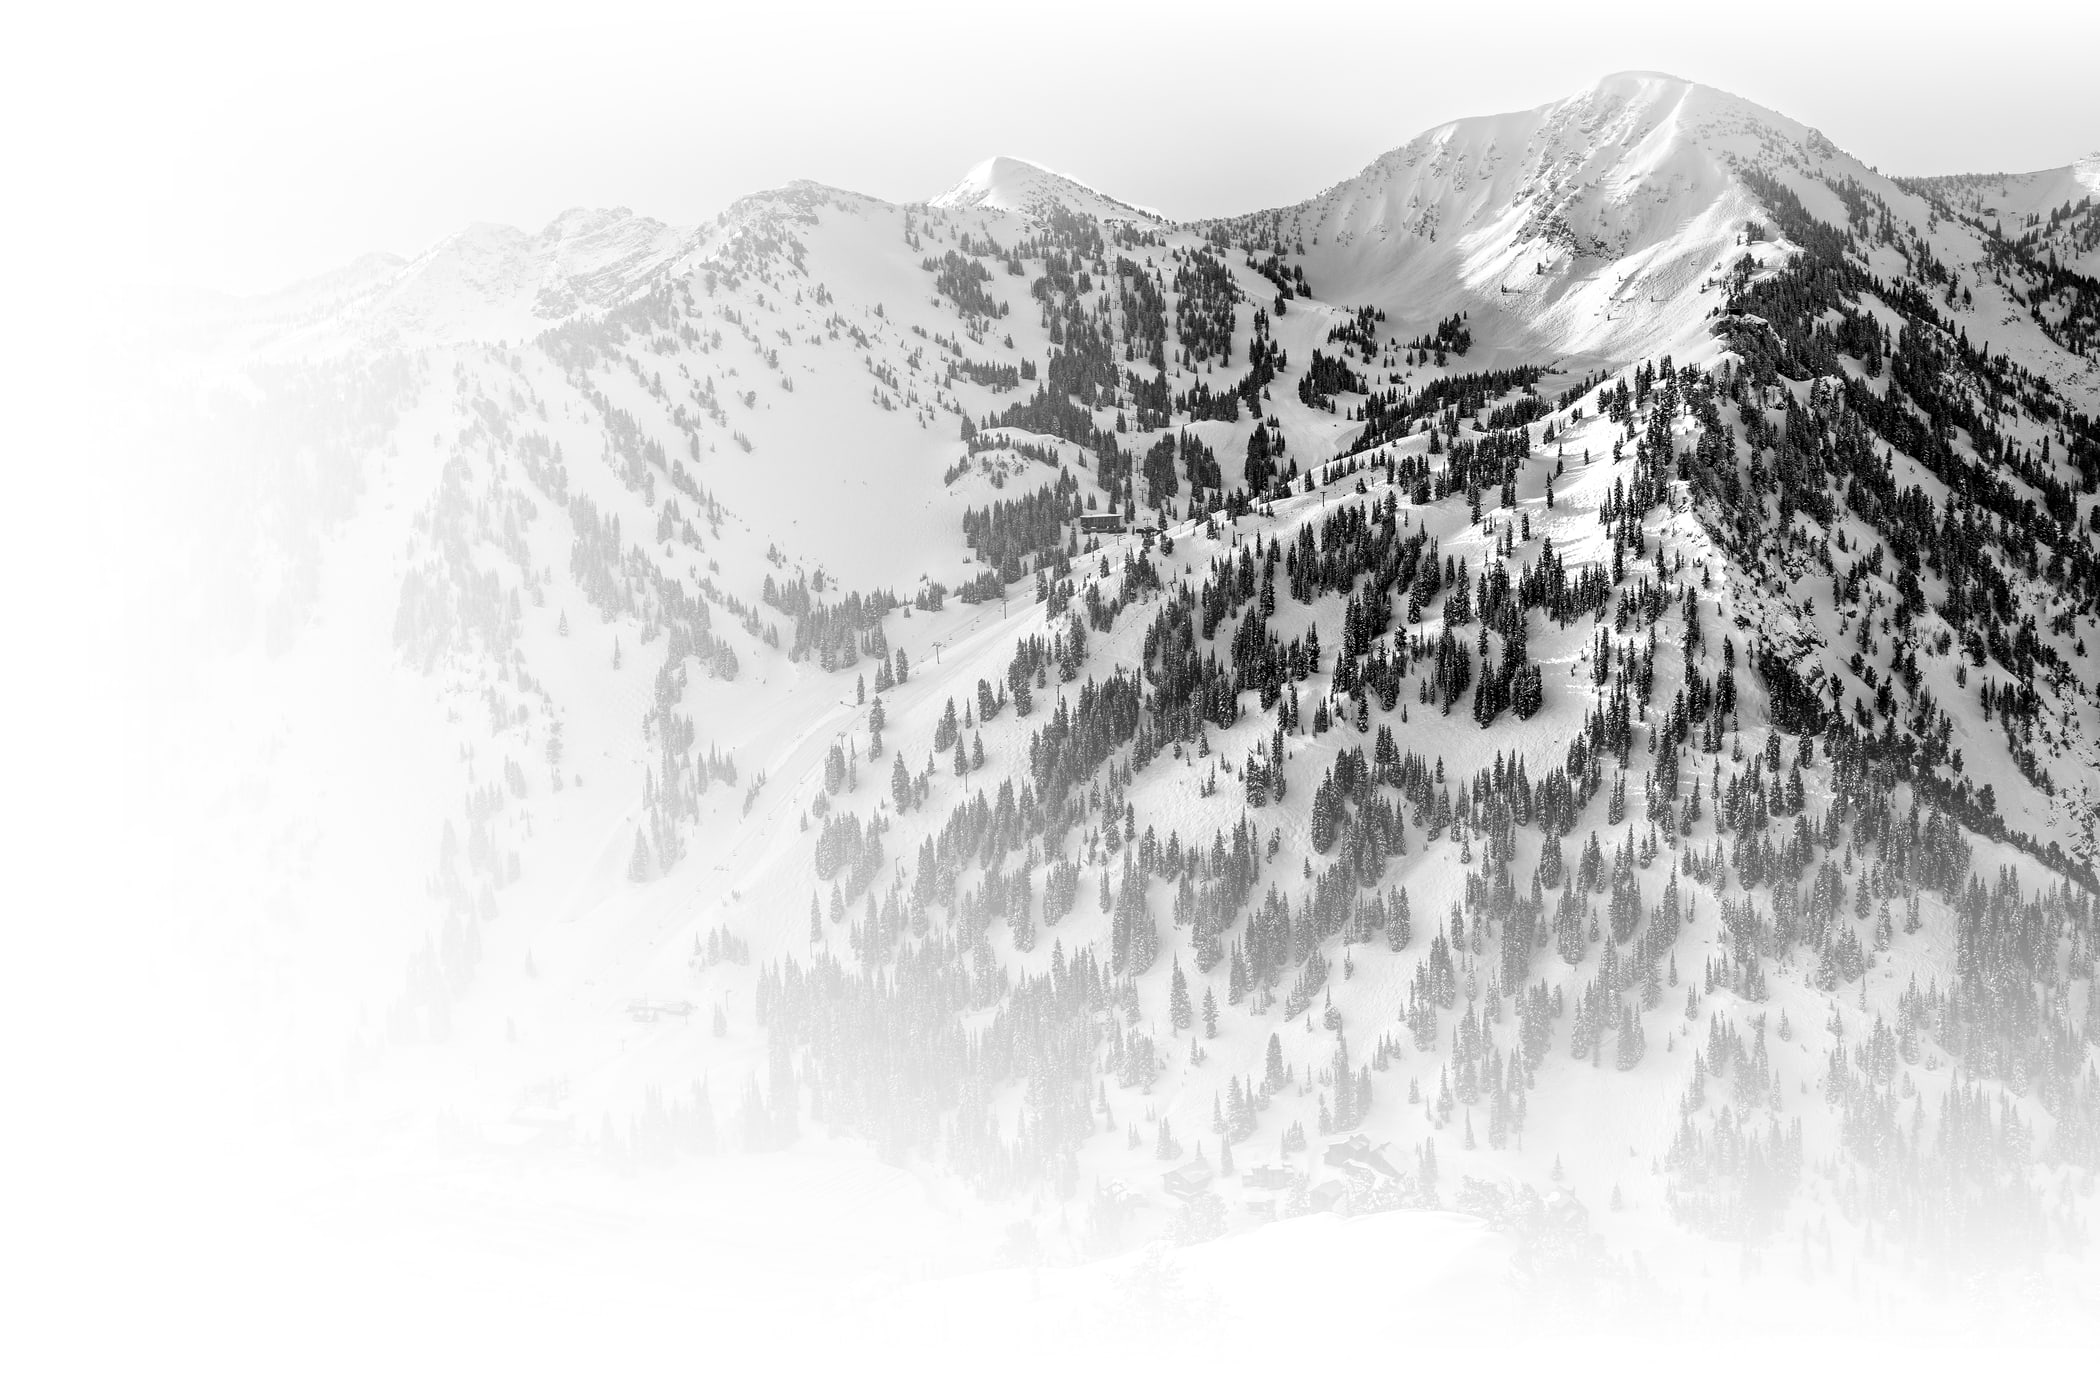 Alta Ski Area aerial view